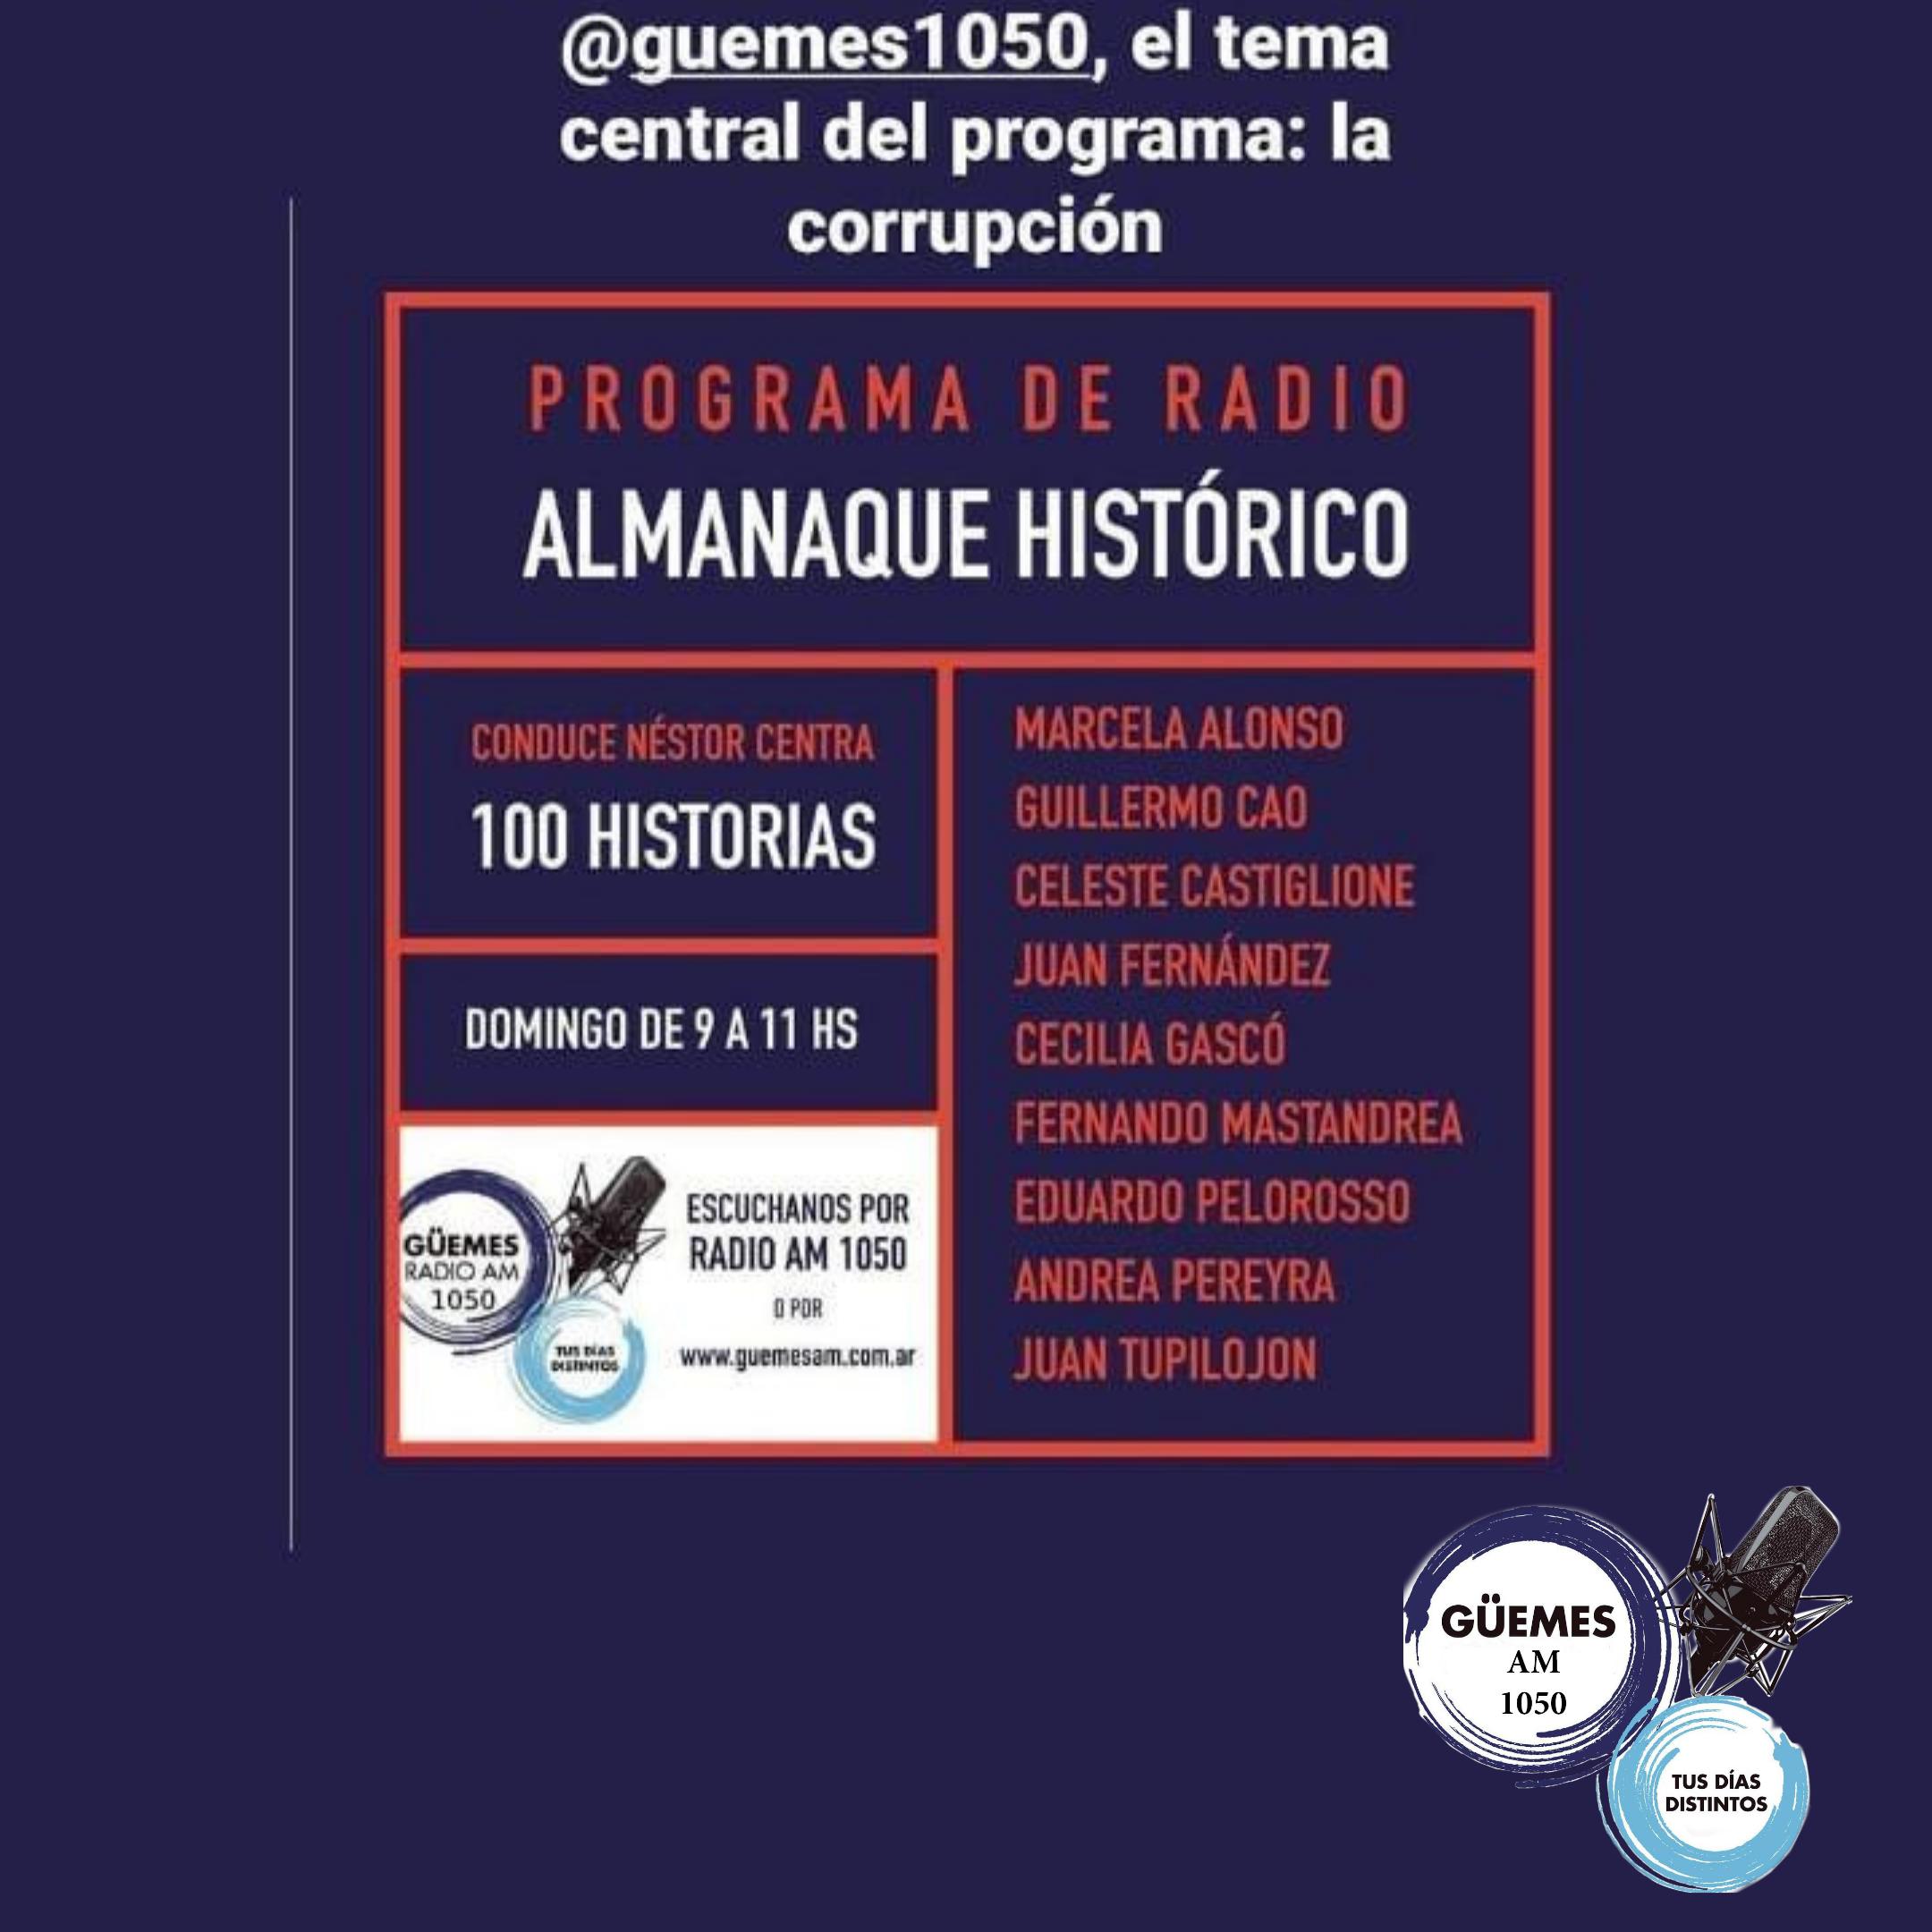 Almanaque Histórico. Editorial por Guillermo Cao.